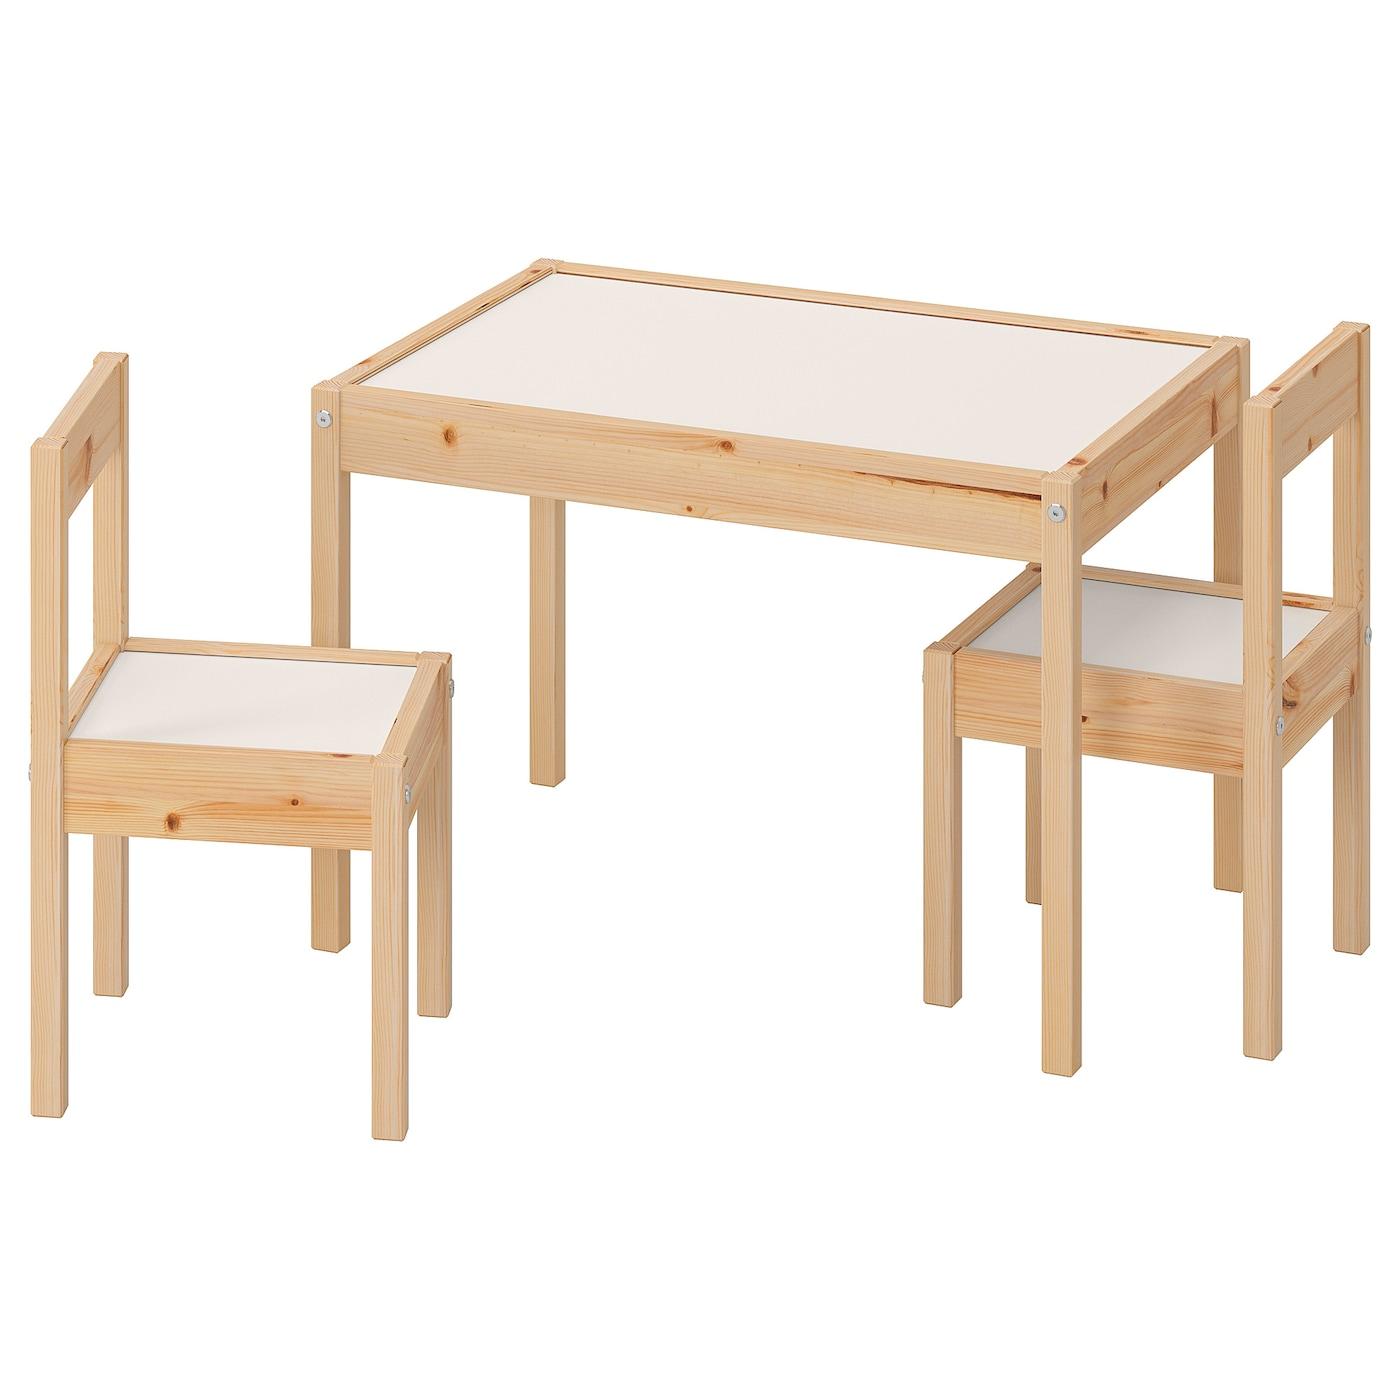 LÄTT レット 子ども用テーブル チェア2脚付